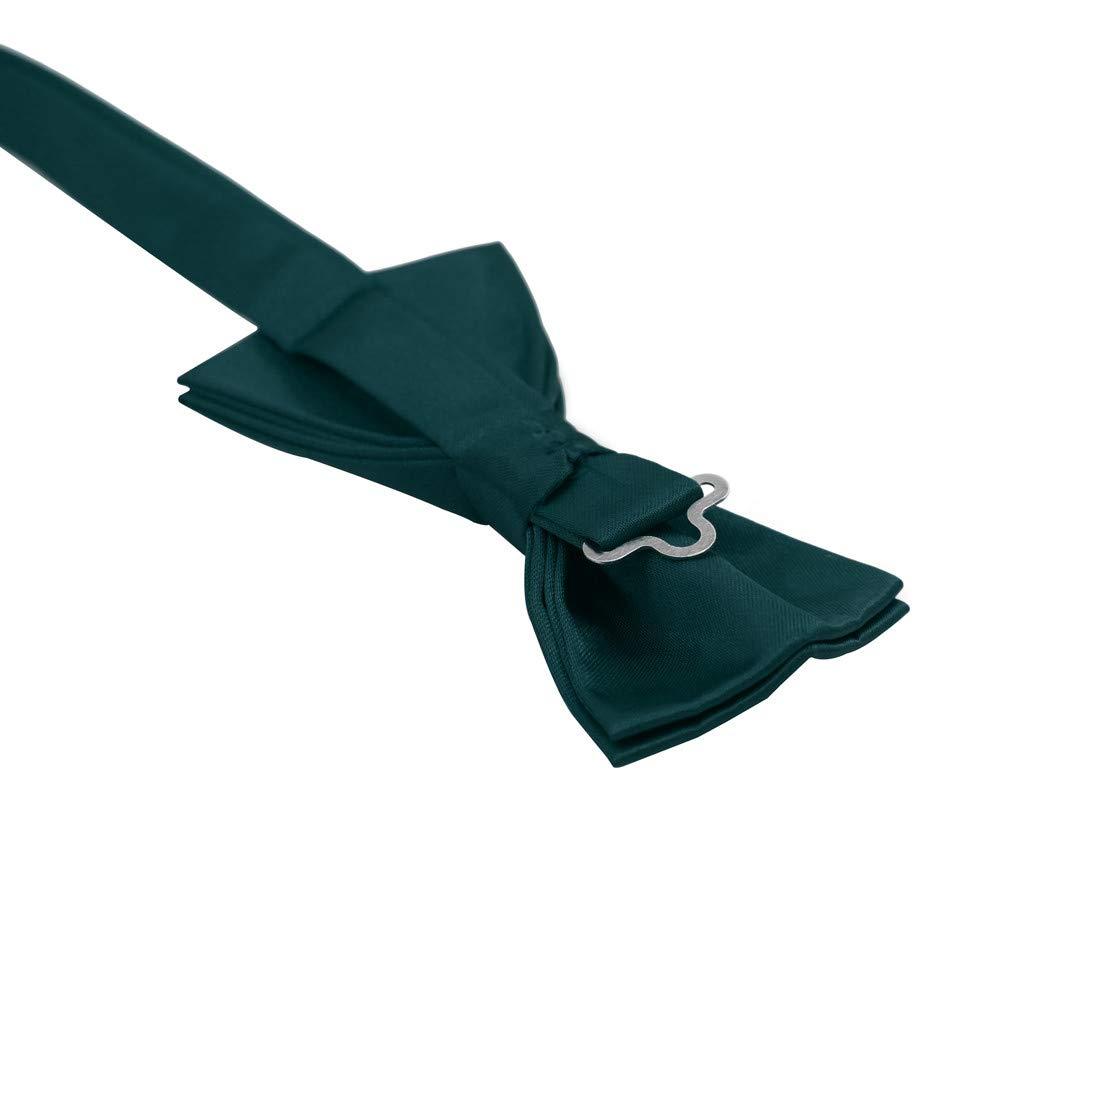 Dan Smith DGEE0001-M Black Solid Microfiber Design Dress Vests Satin For Work-Utility Vest Matching Bow Tie